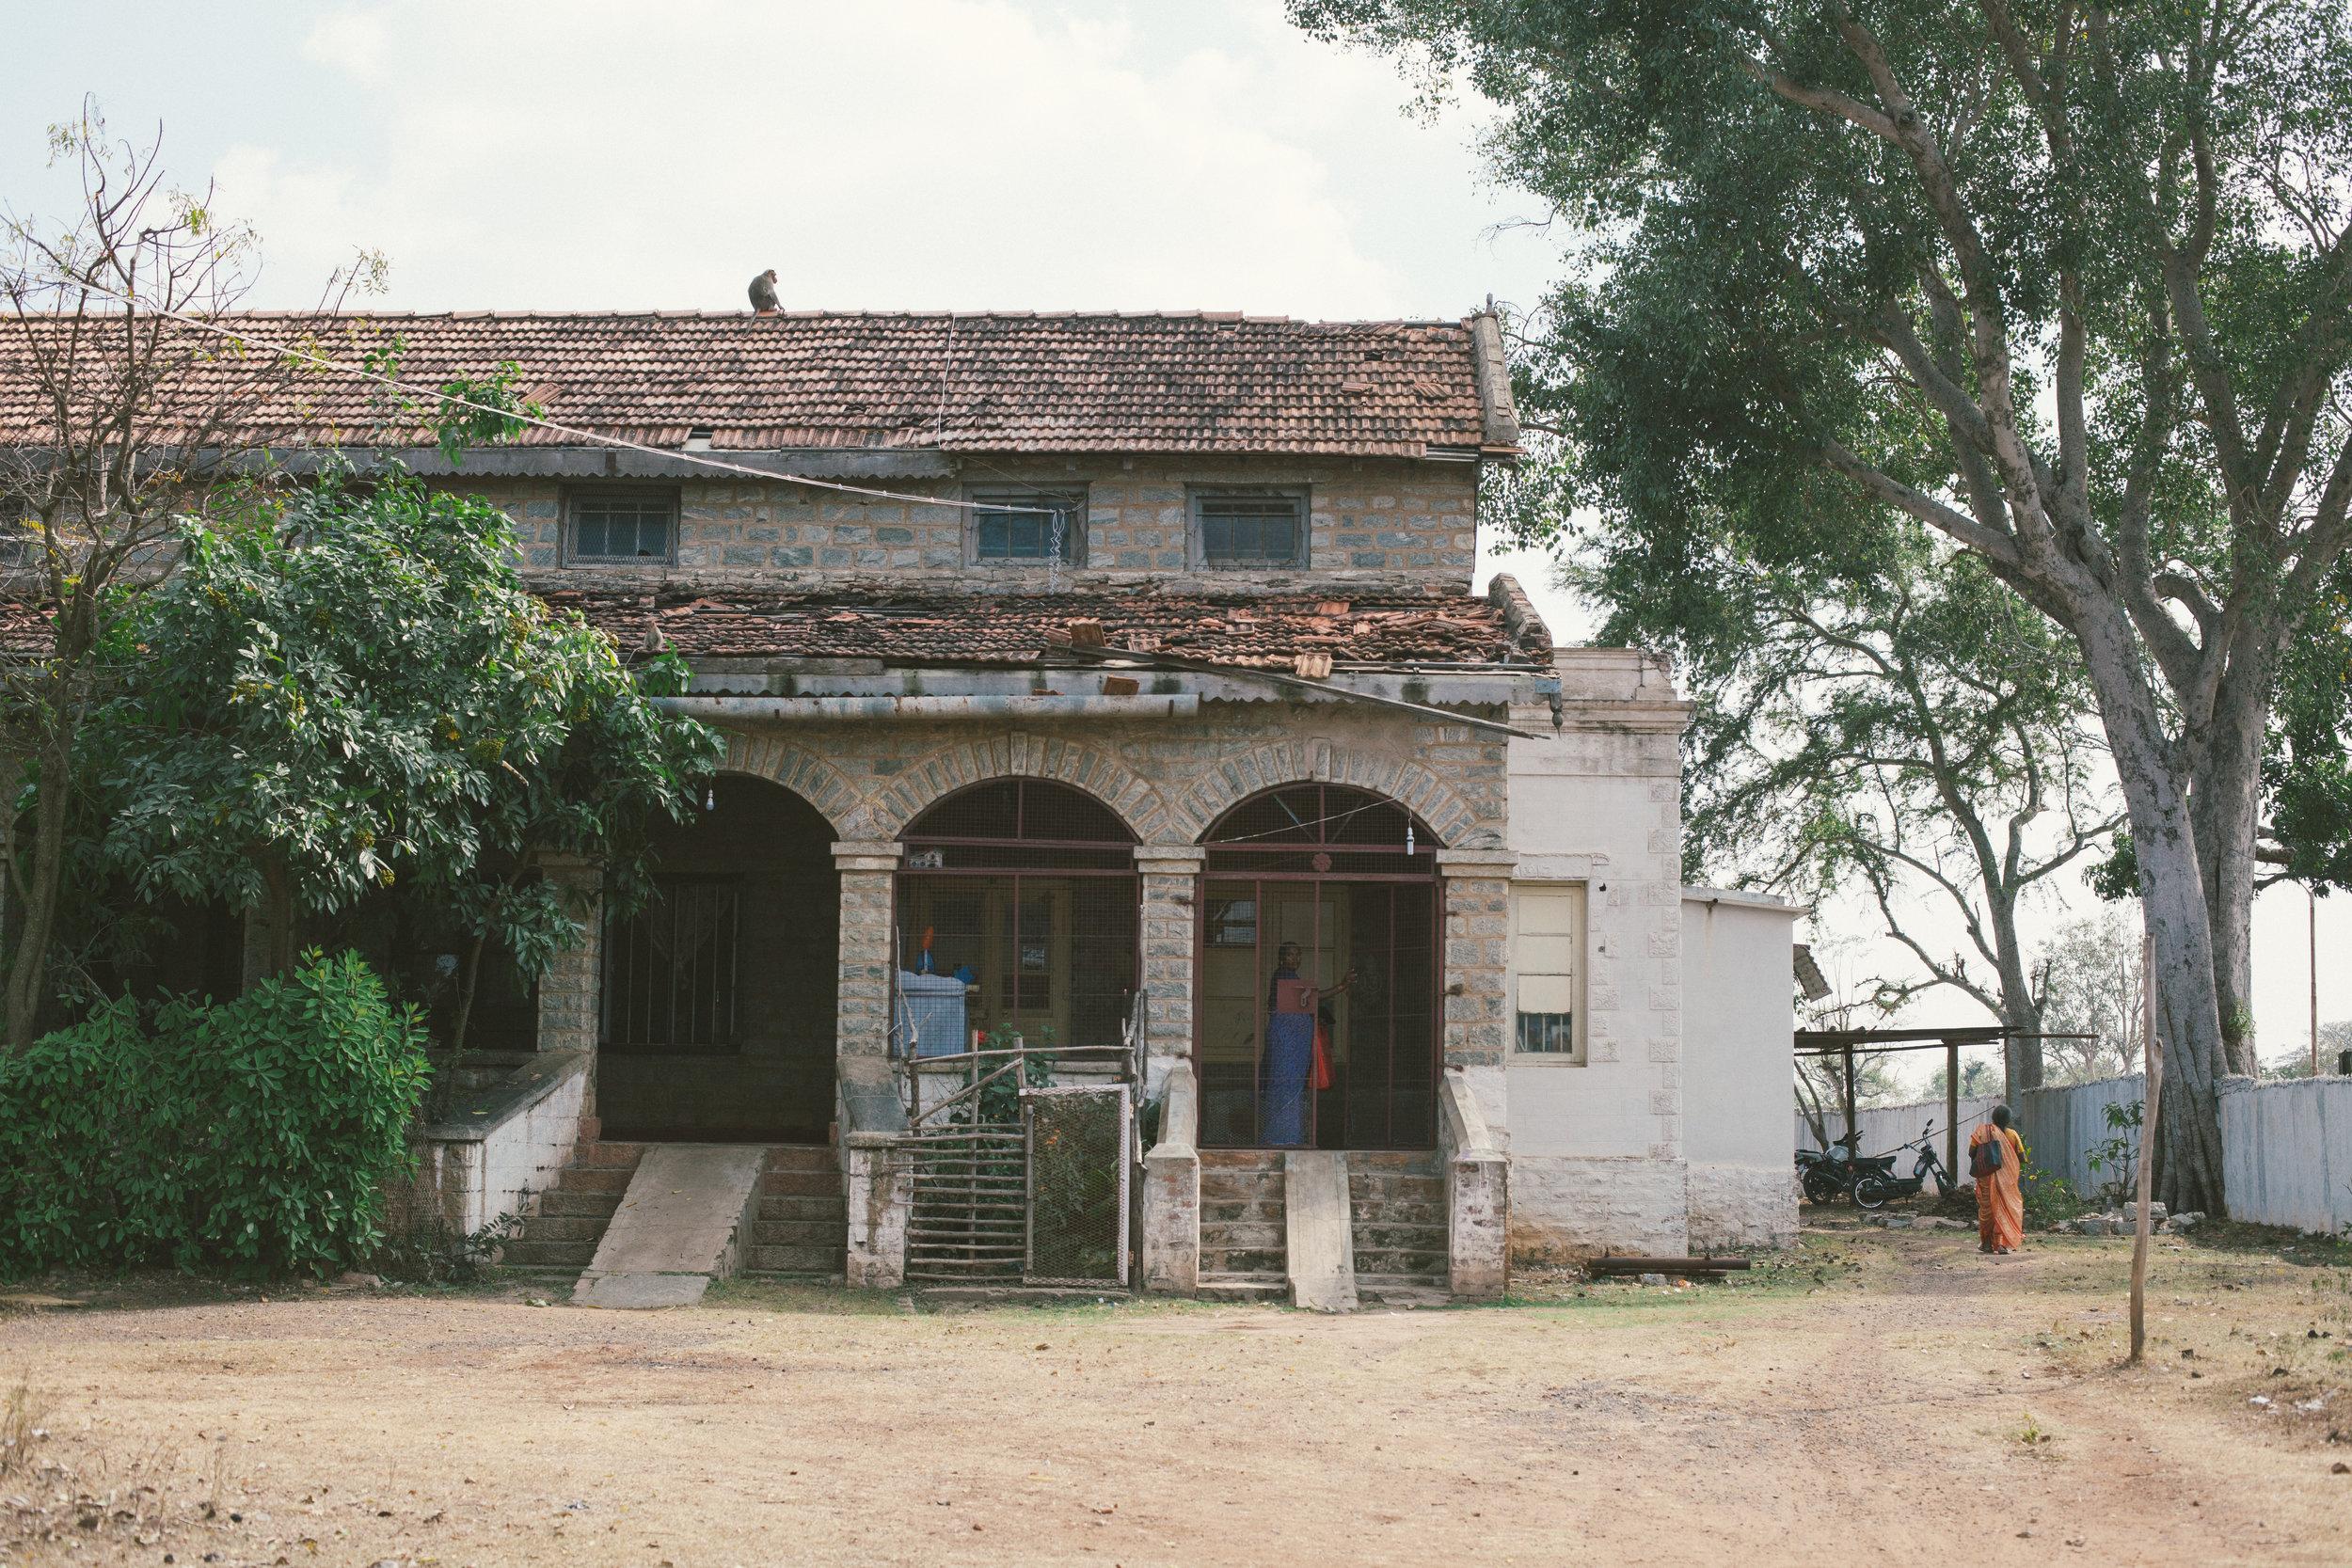 western style house.jpg